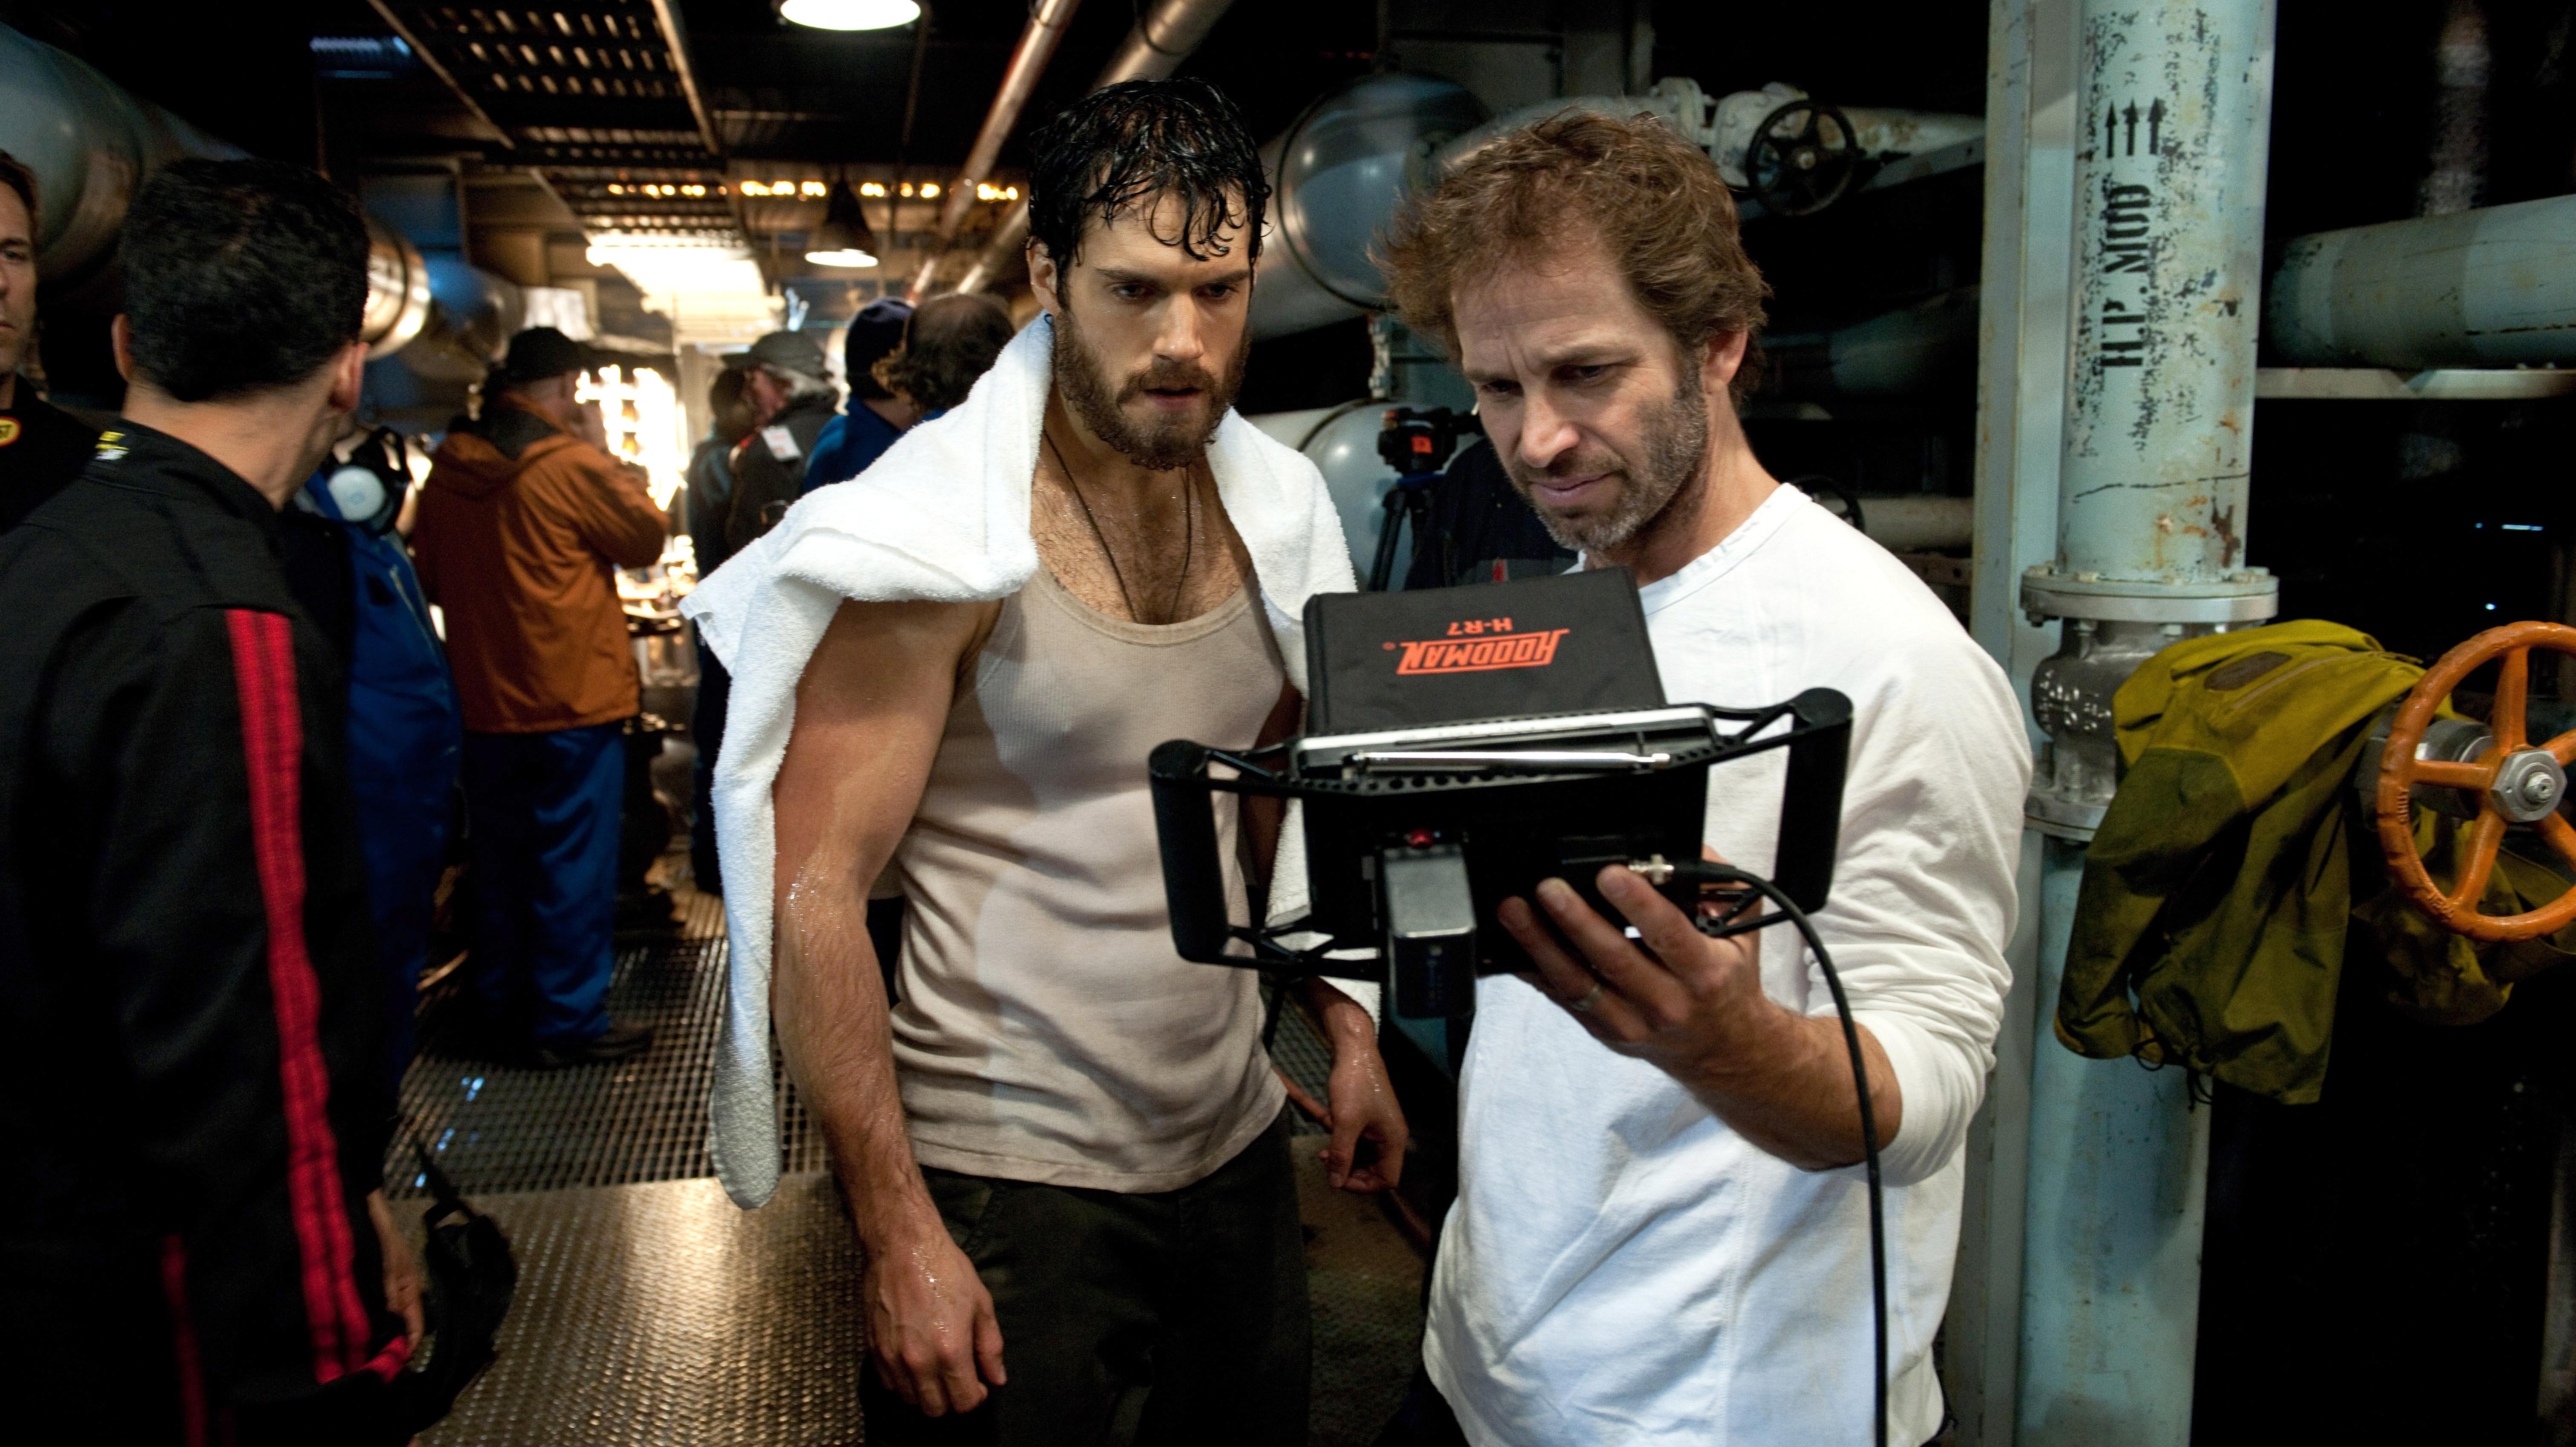 Zack Snyder, Making Superman Over For Our Era